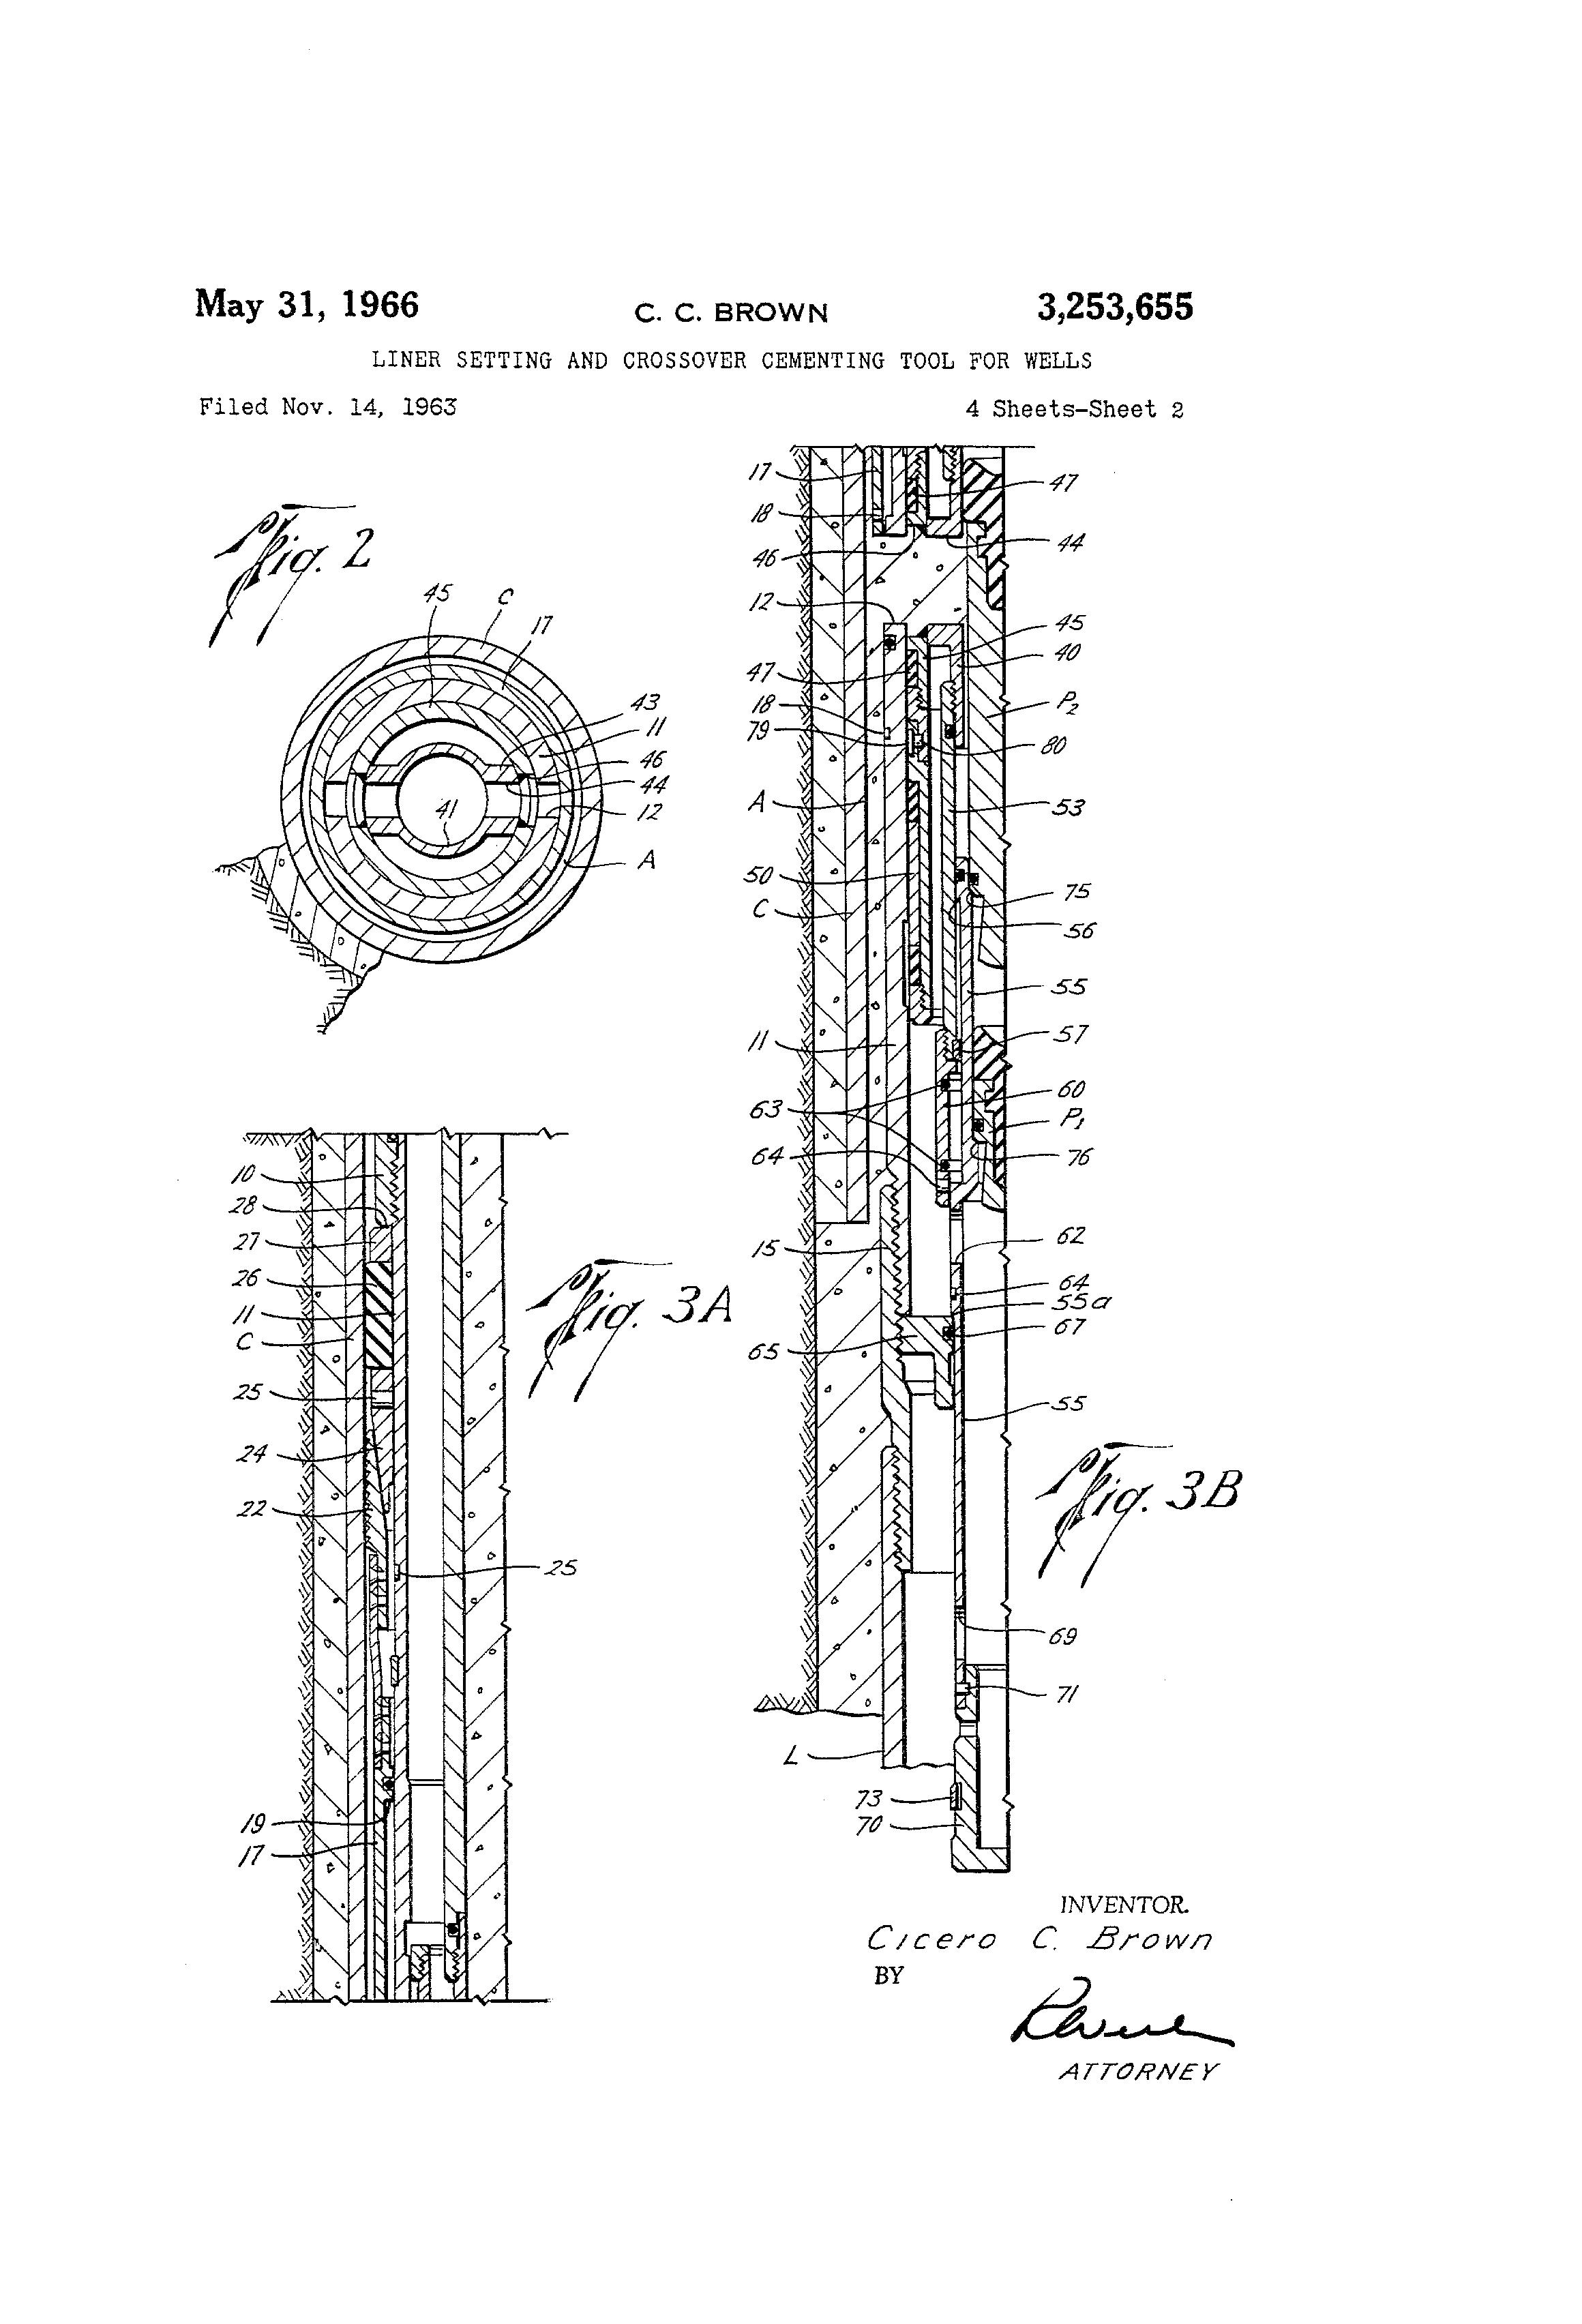 براءة الاختراع US3253655 - Liner setting and crossover cementing